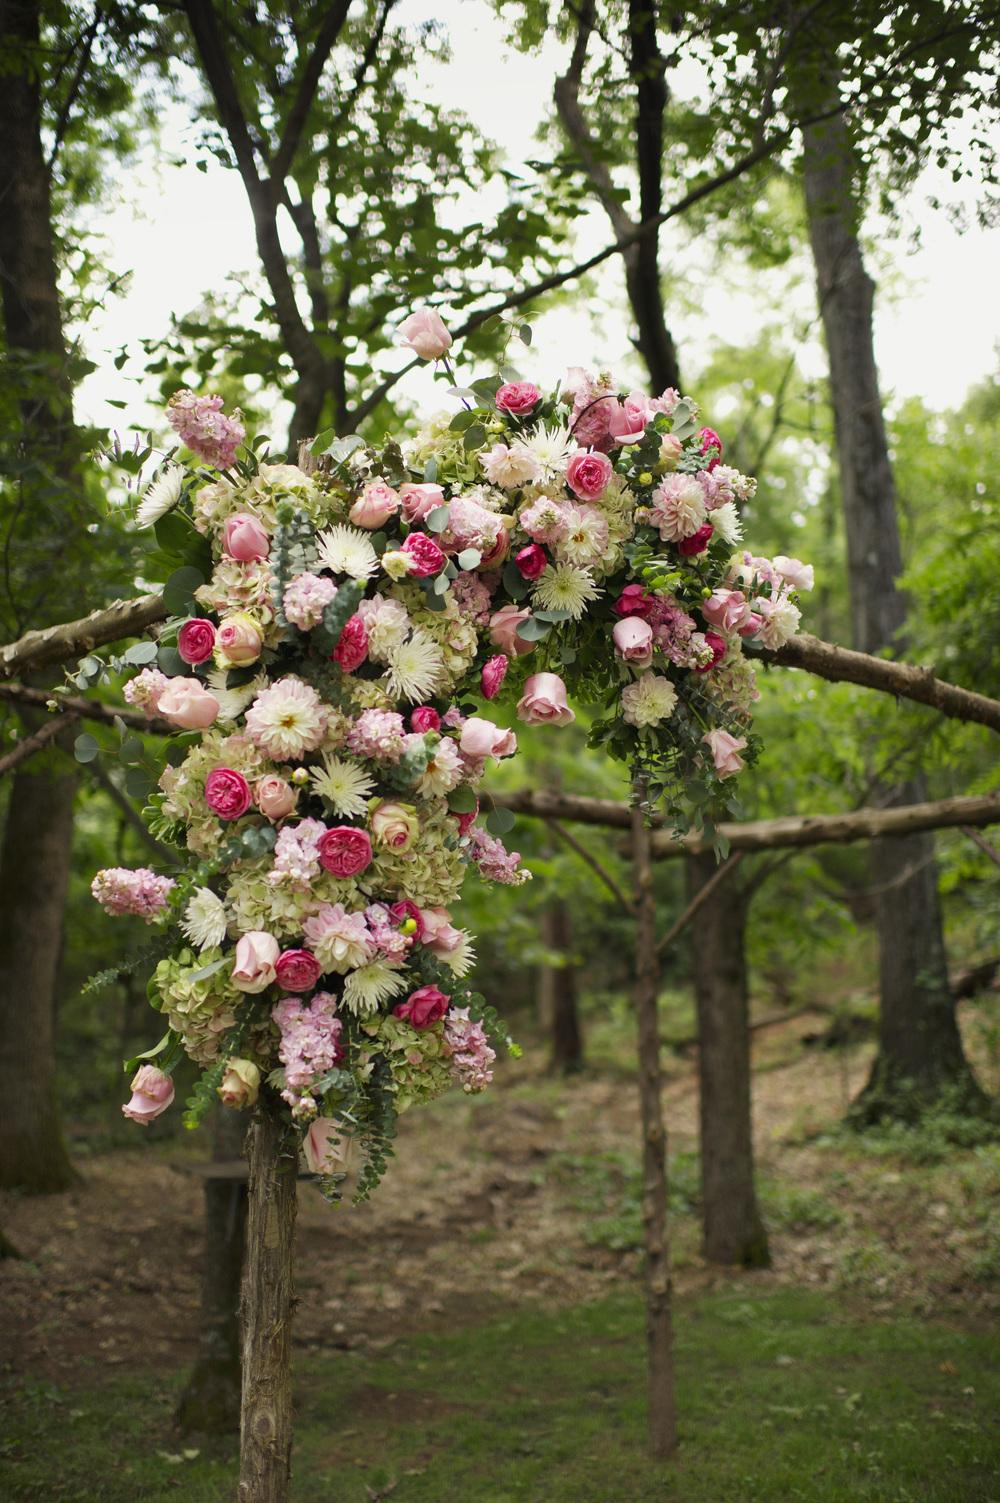 jessica-zimmerman-events-floral-event-design-coordination-planning-wedding-invitations-neutral-blush-silk-ribbon-organic-bouquet-conway-arkansas-bailey-hepp-pink-outdoor-wedding-ceremony-floral-huppah